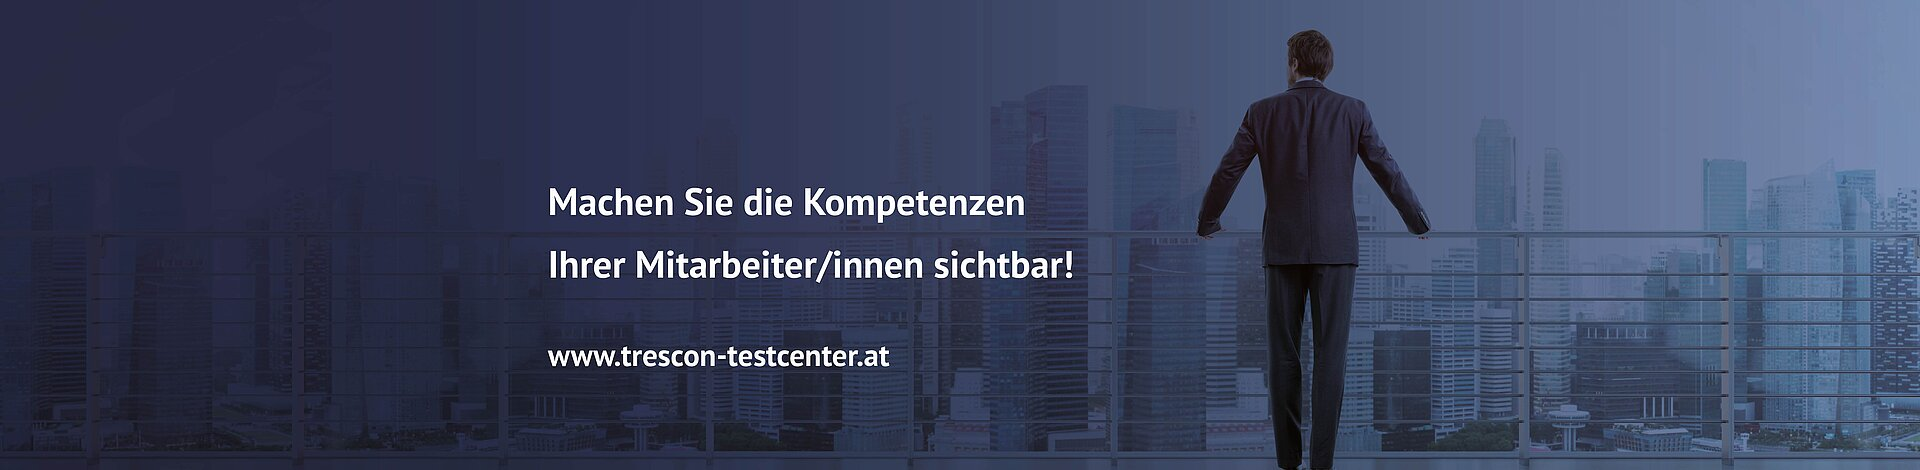 [Translate to English:] TRESCON TestCenter